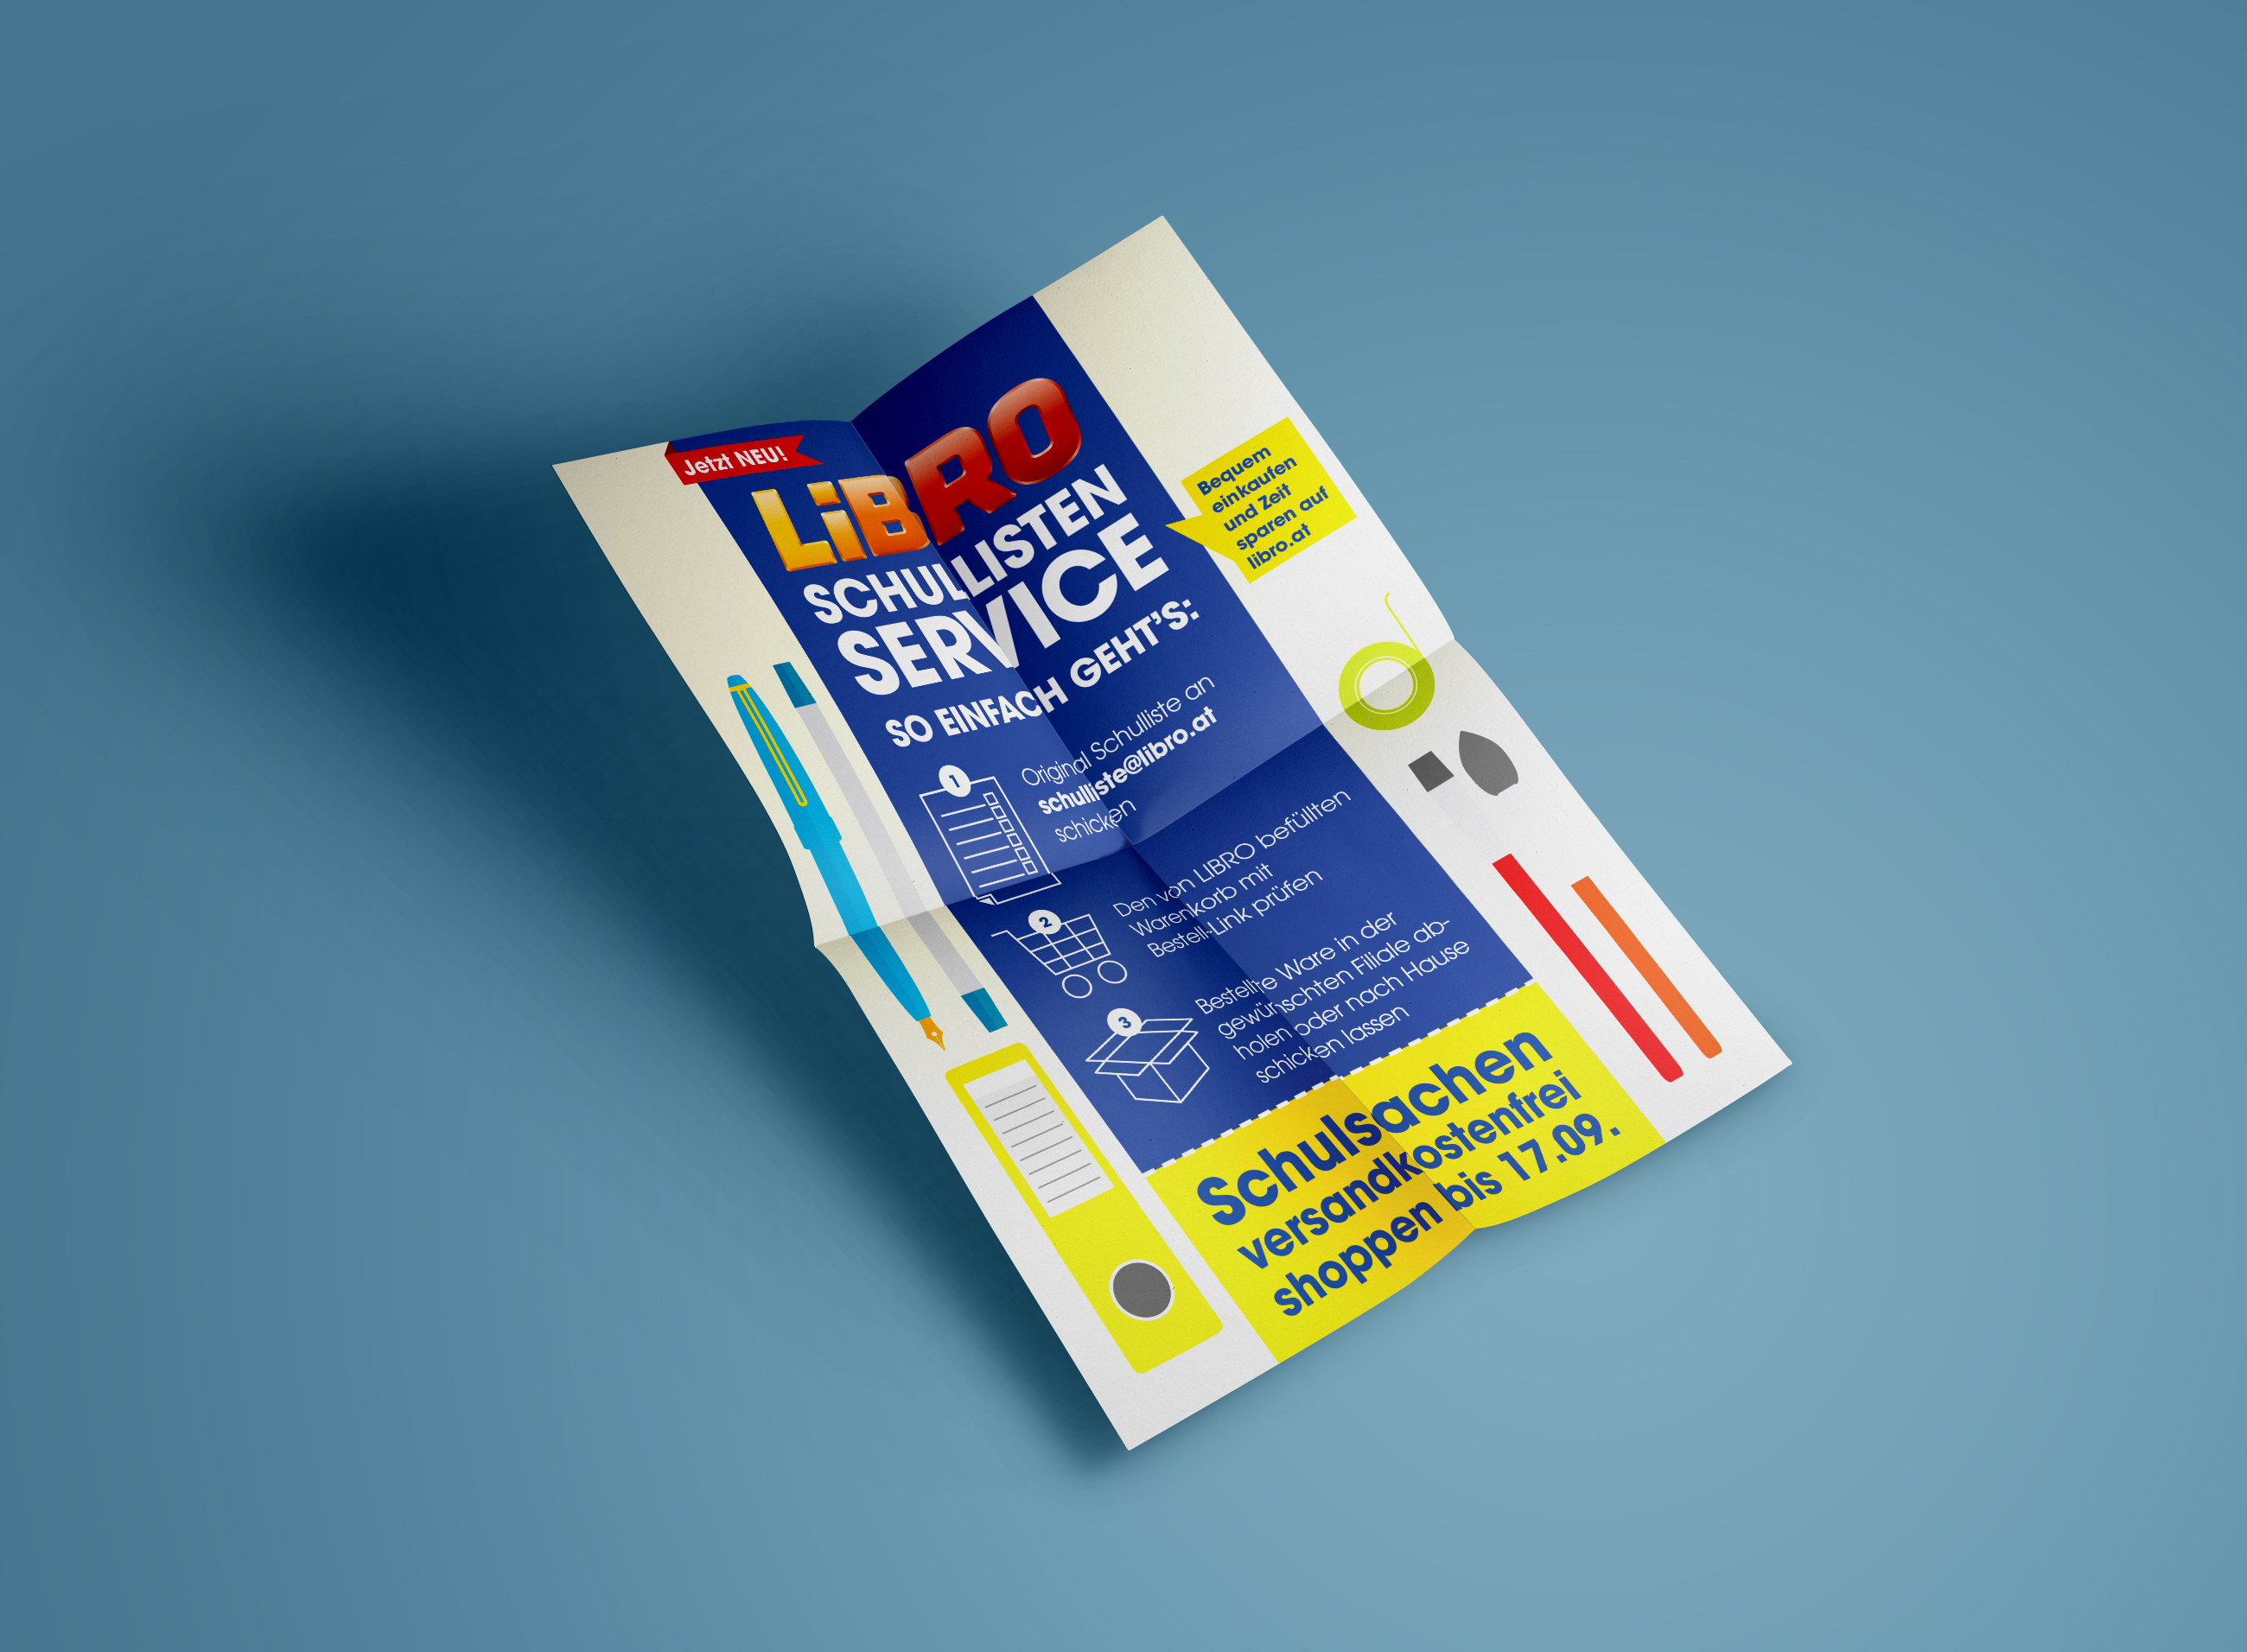 libro_schulllistenservice_poster01